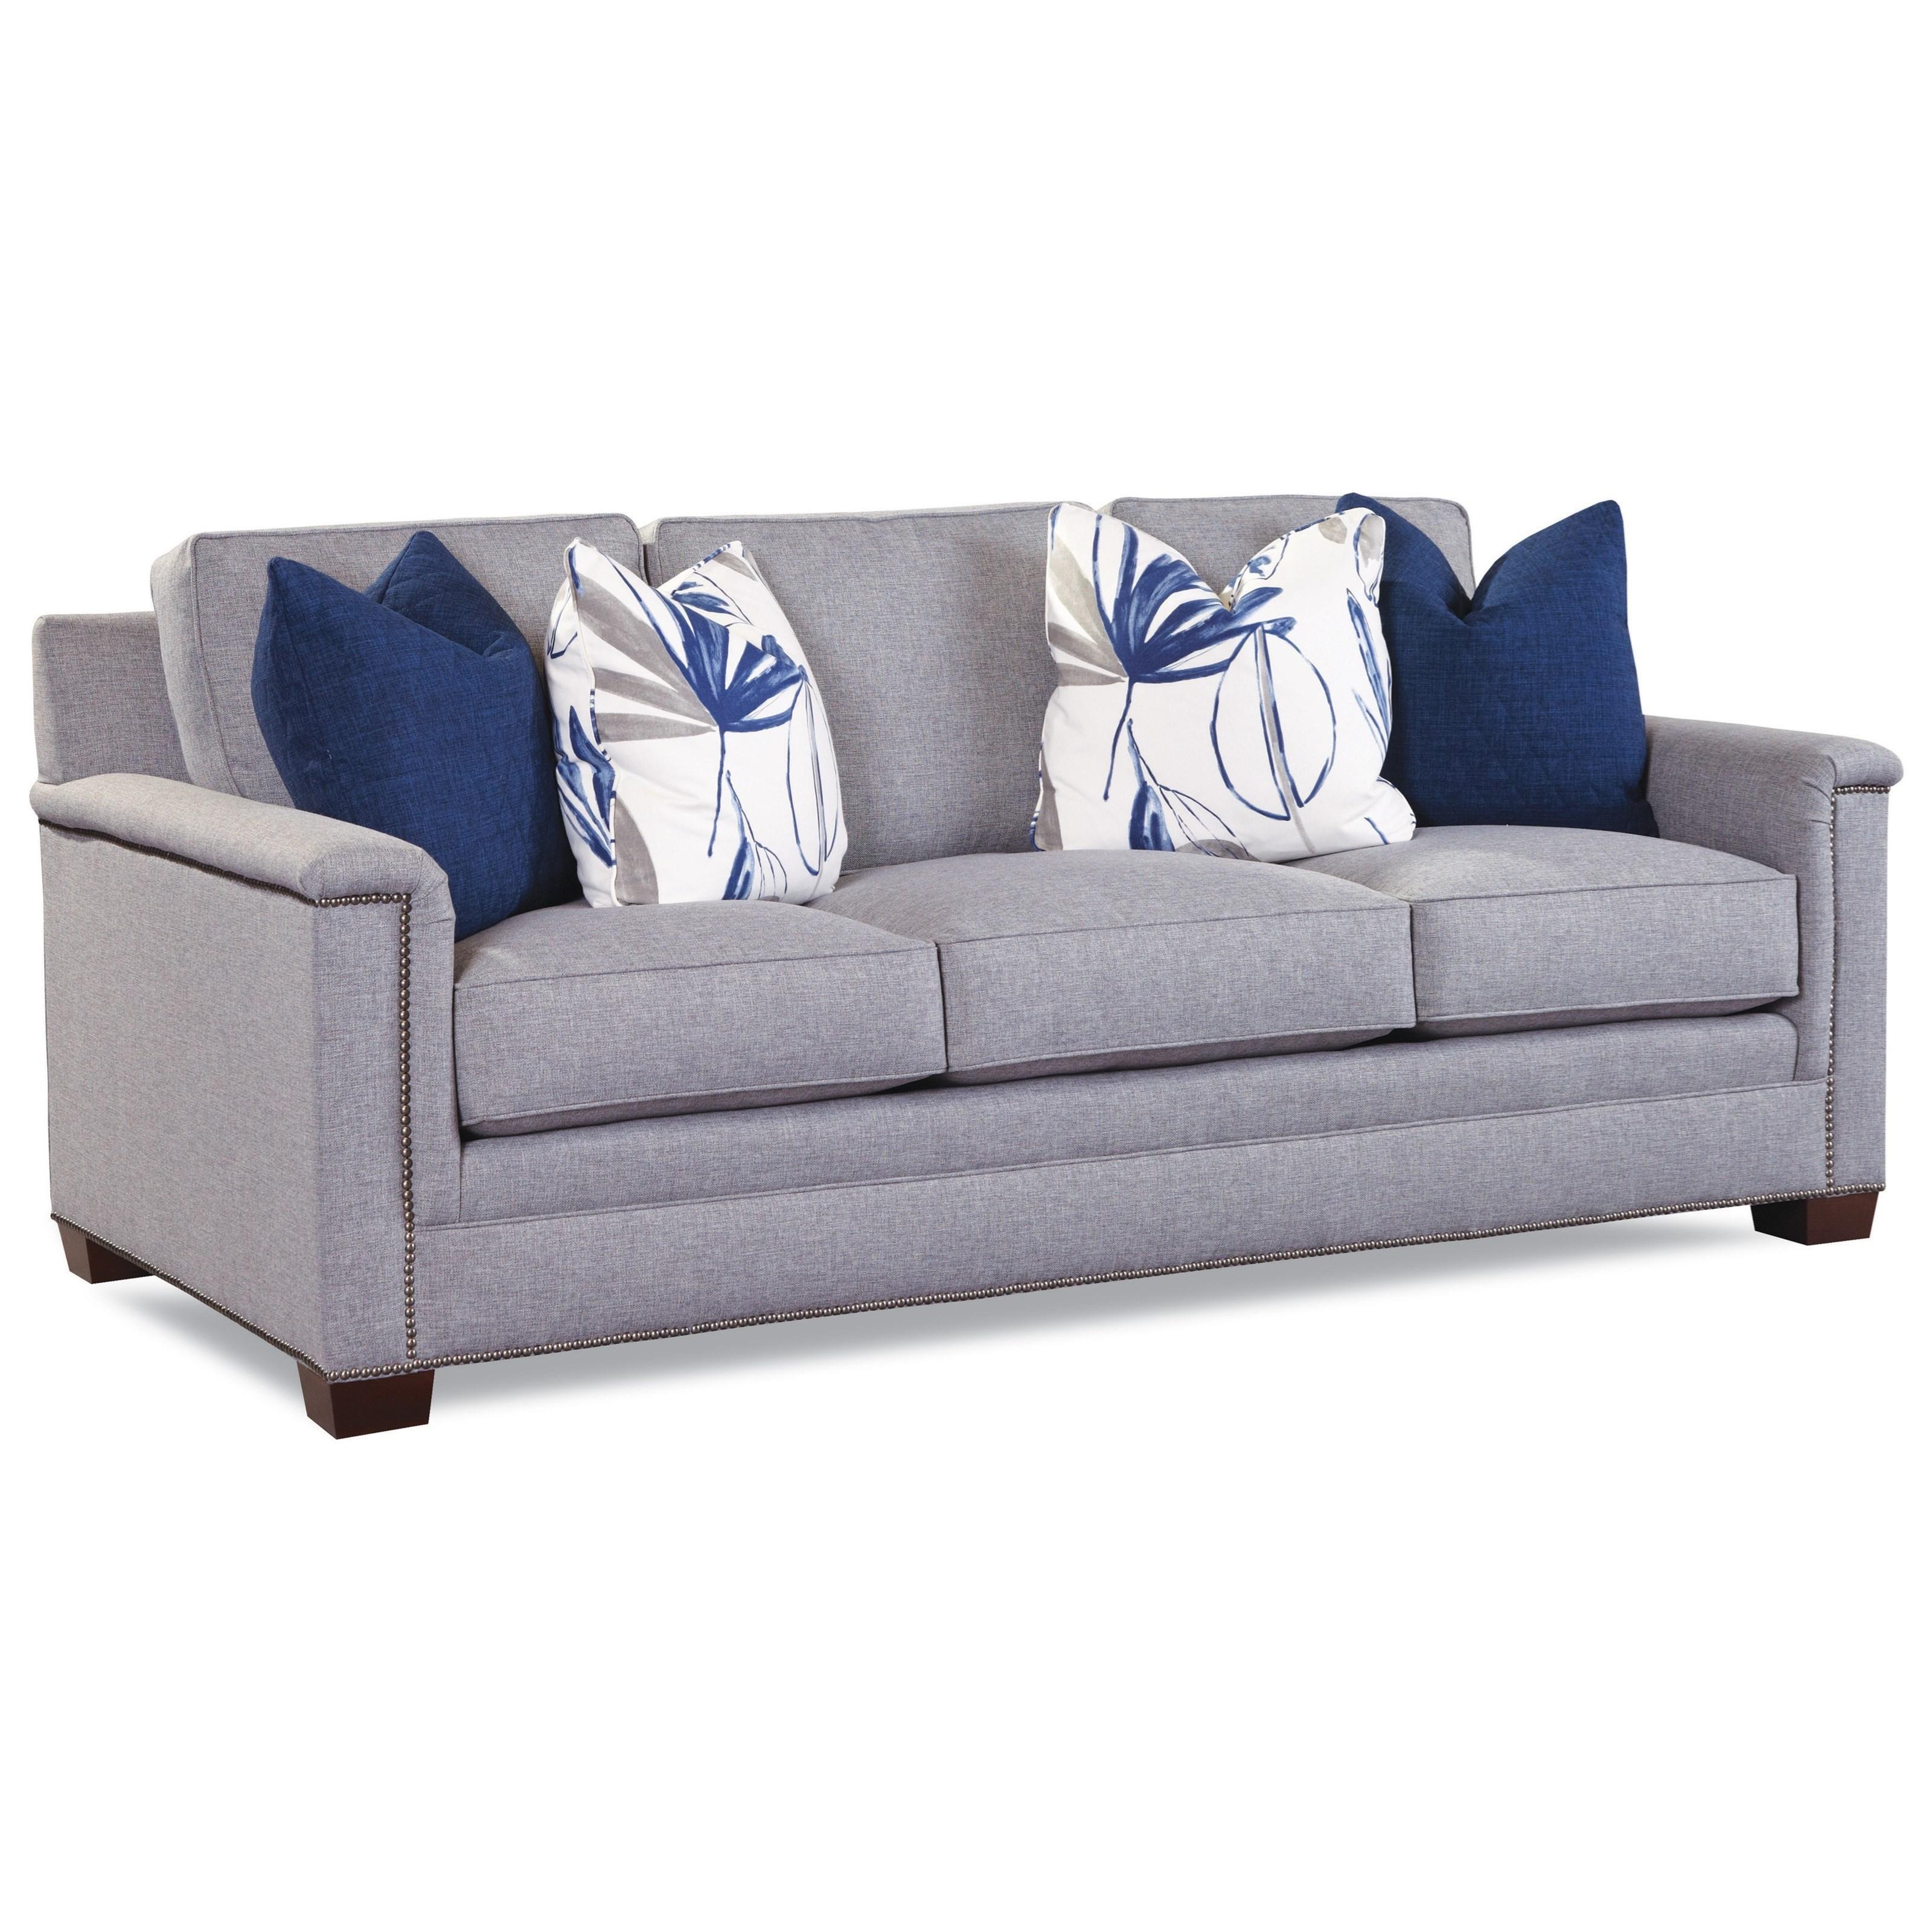 "2062 89"" Sofa by Huntington House at Belfort Furniture"